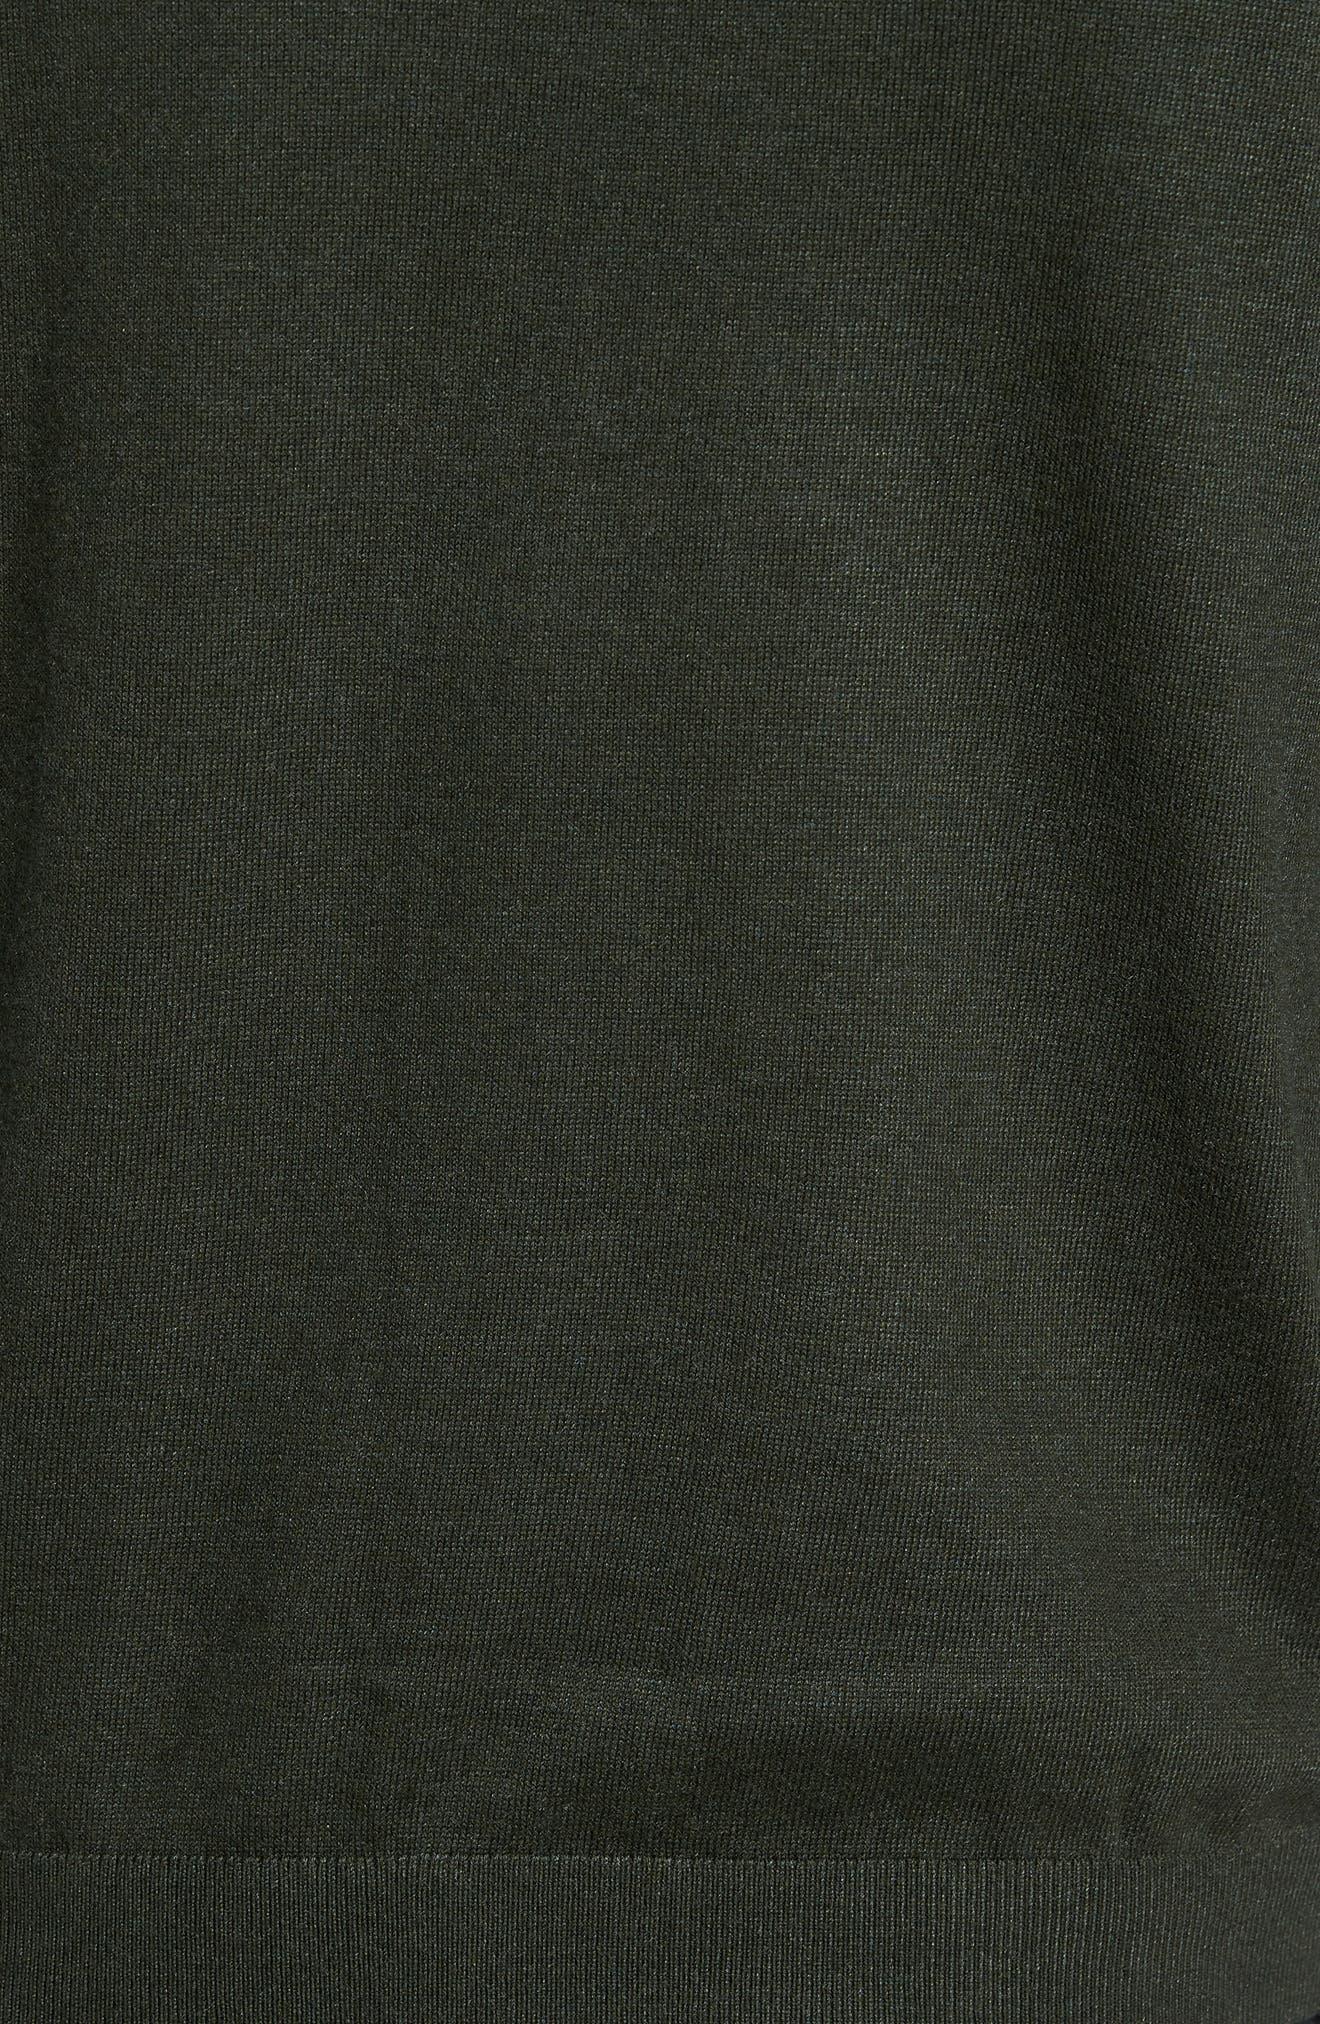 Pepmint Herringbone Sleeve Sweatshirt,                             Alternate thumbnail 10, color,